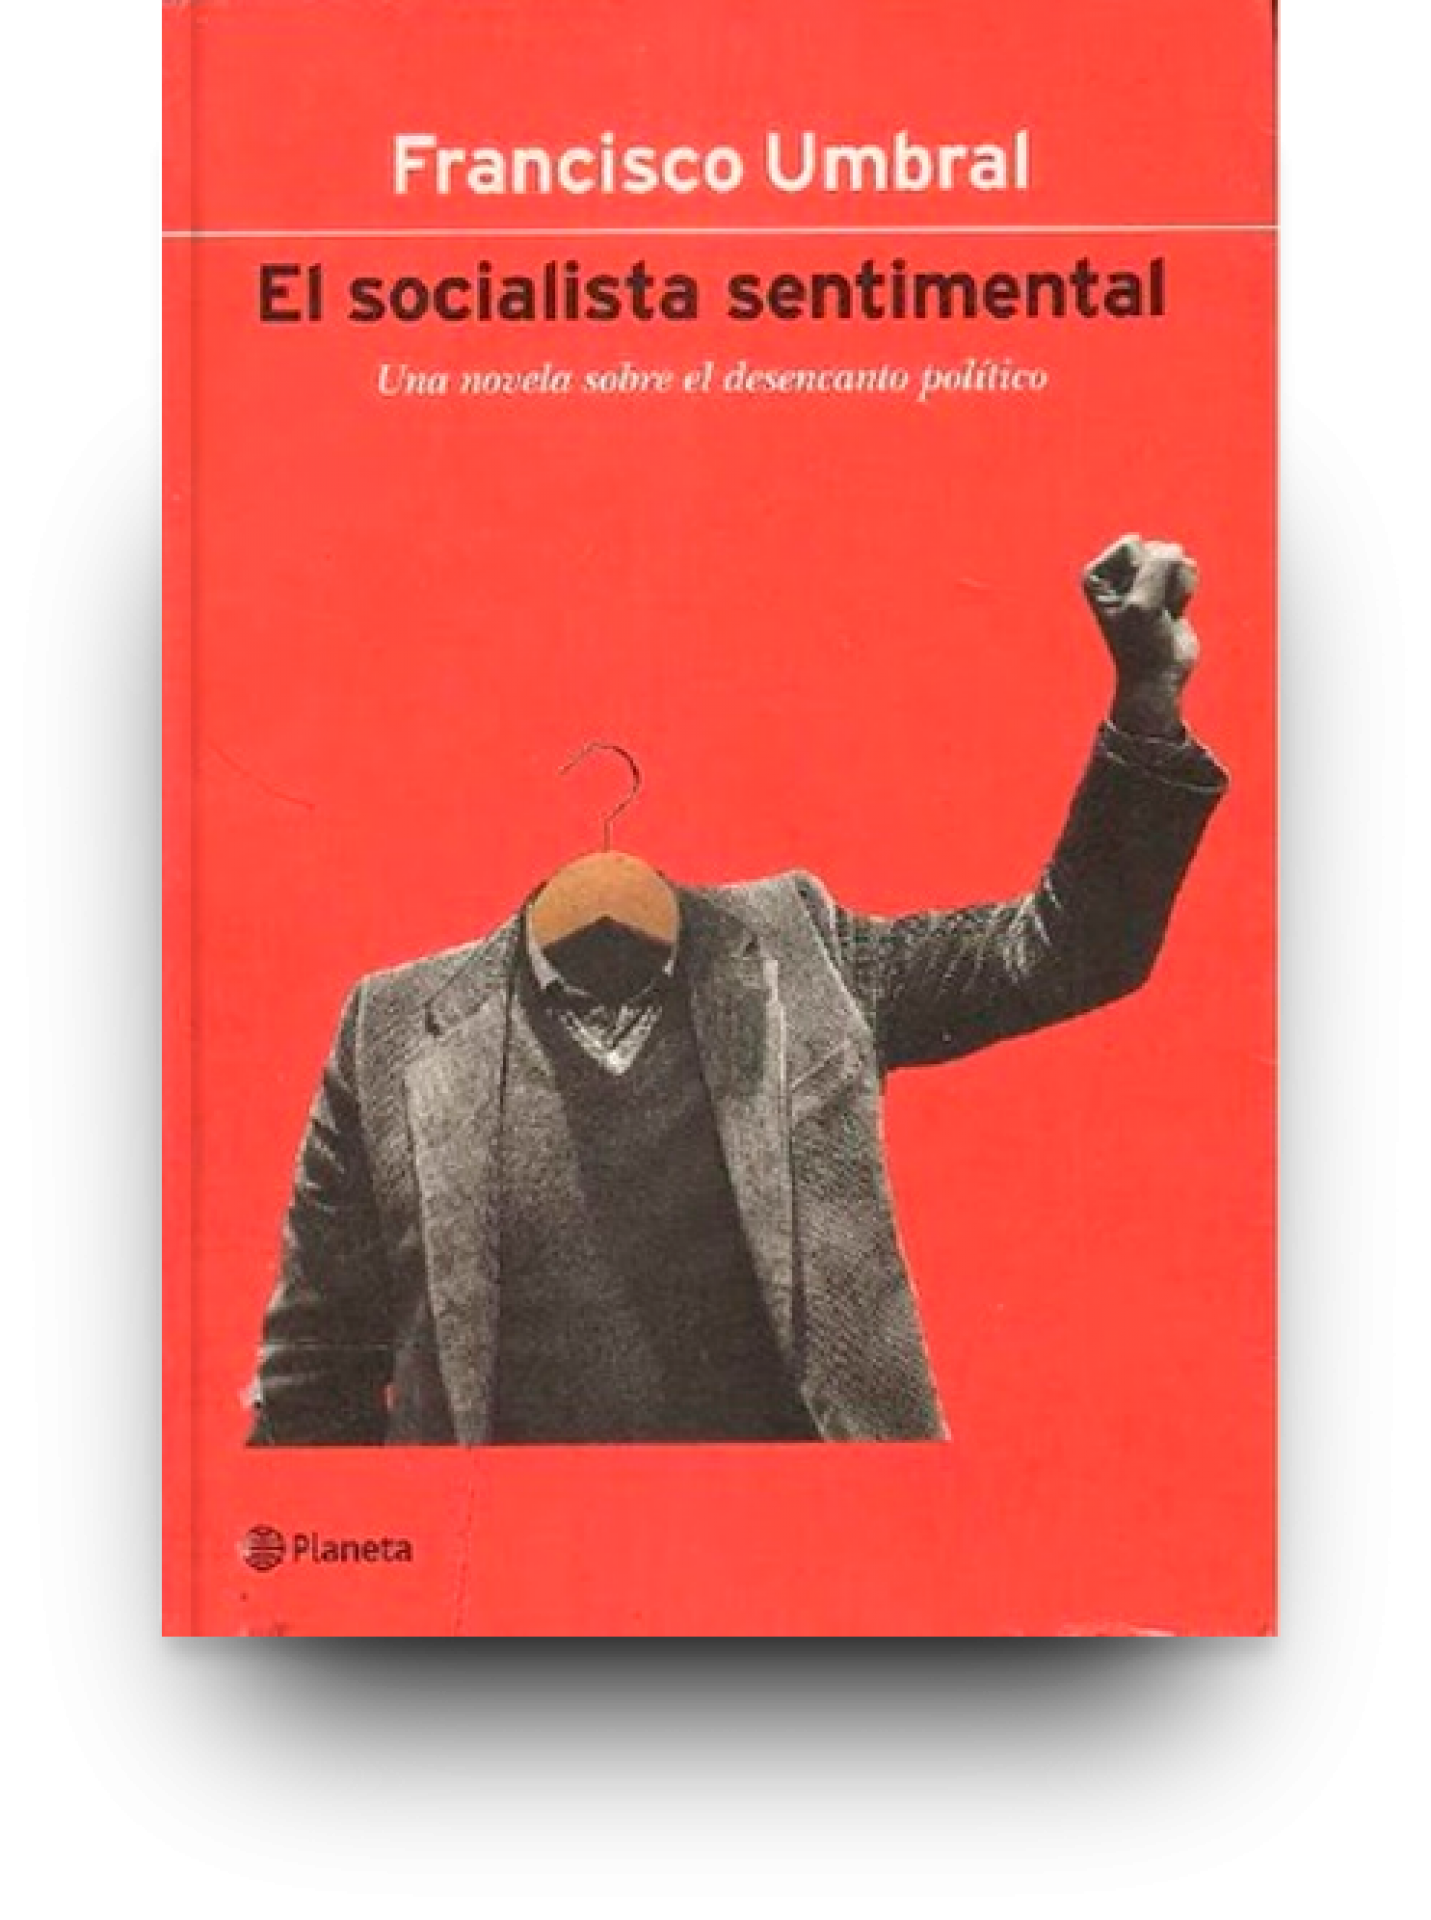 El socialista sentimental